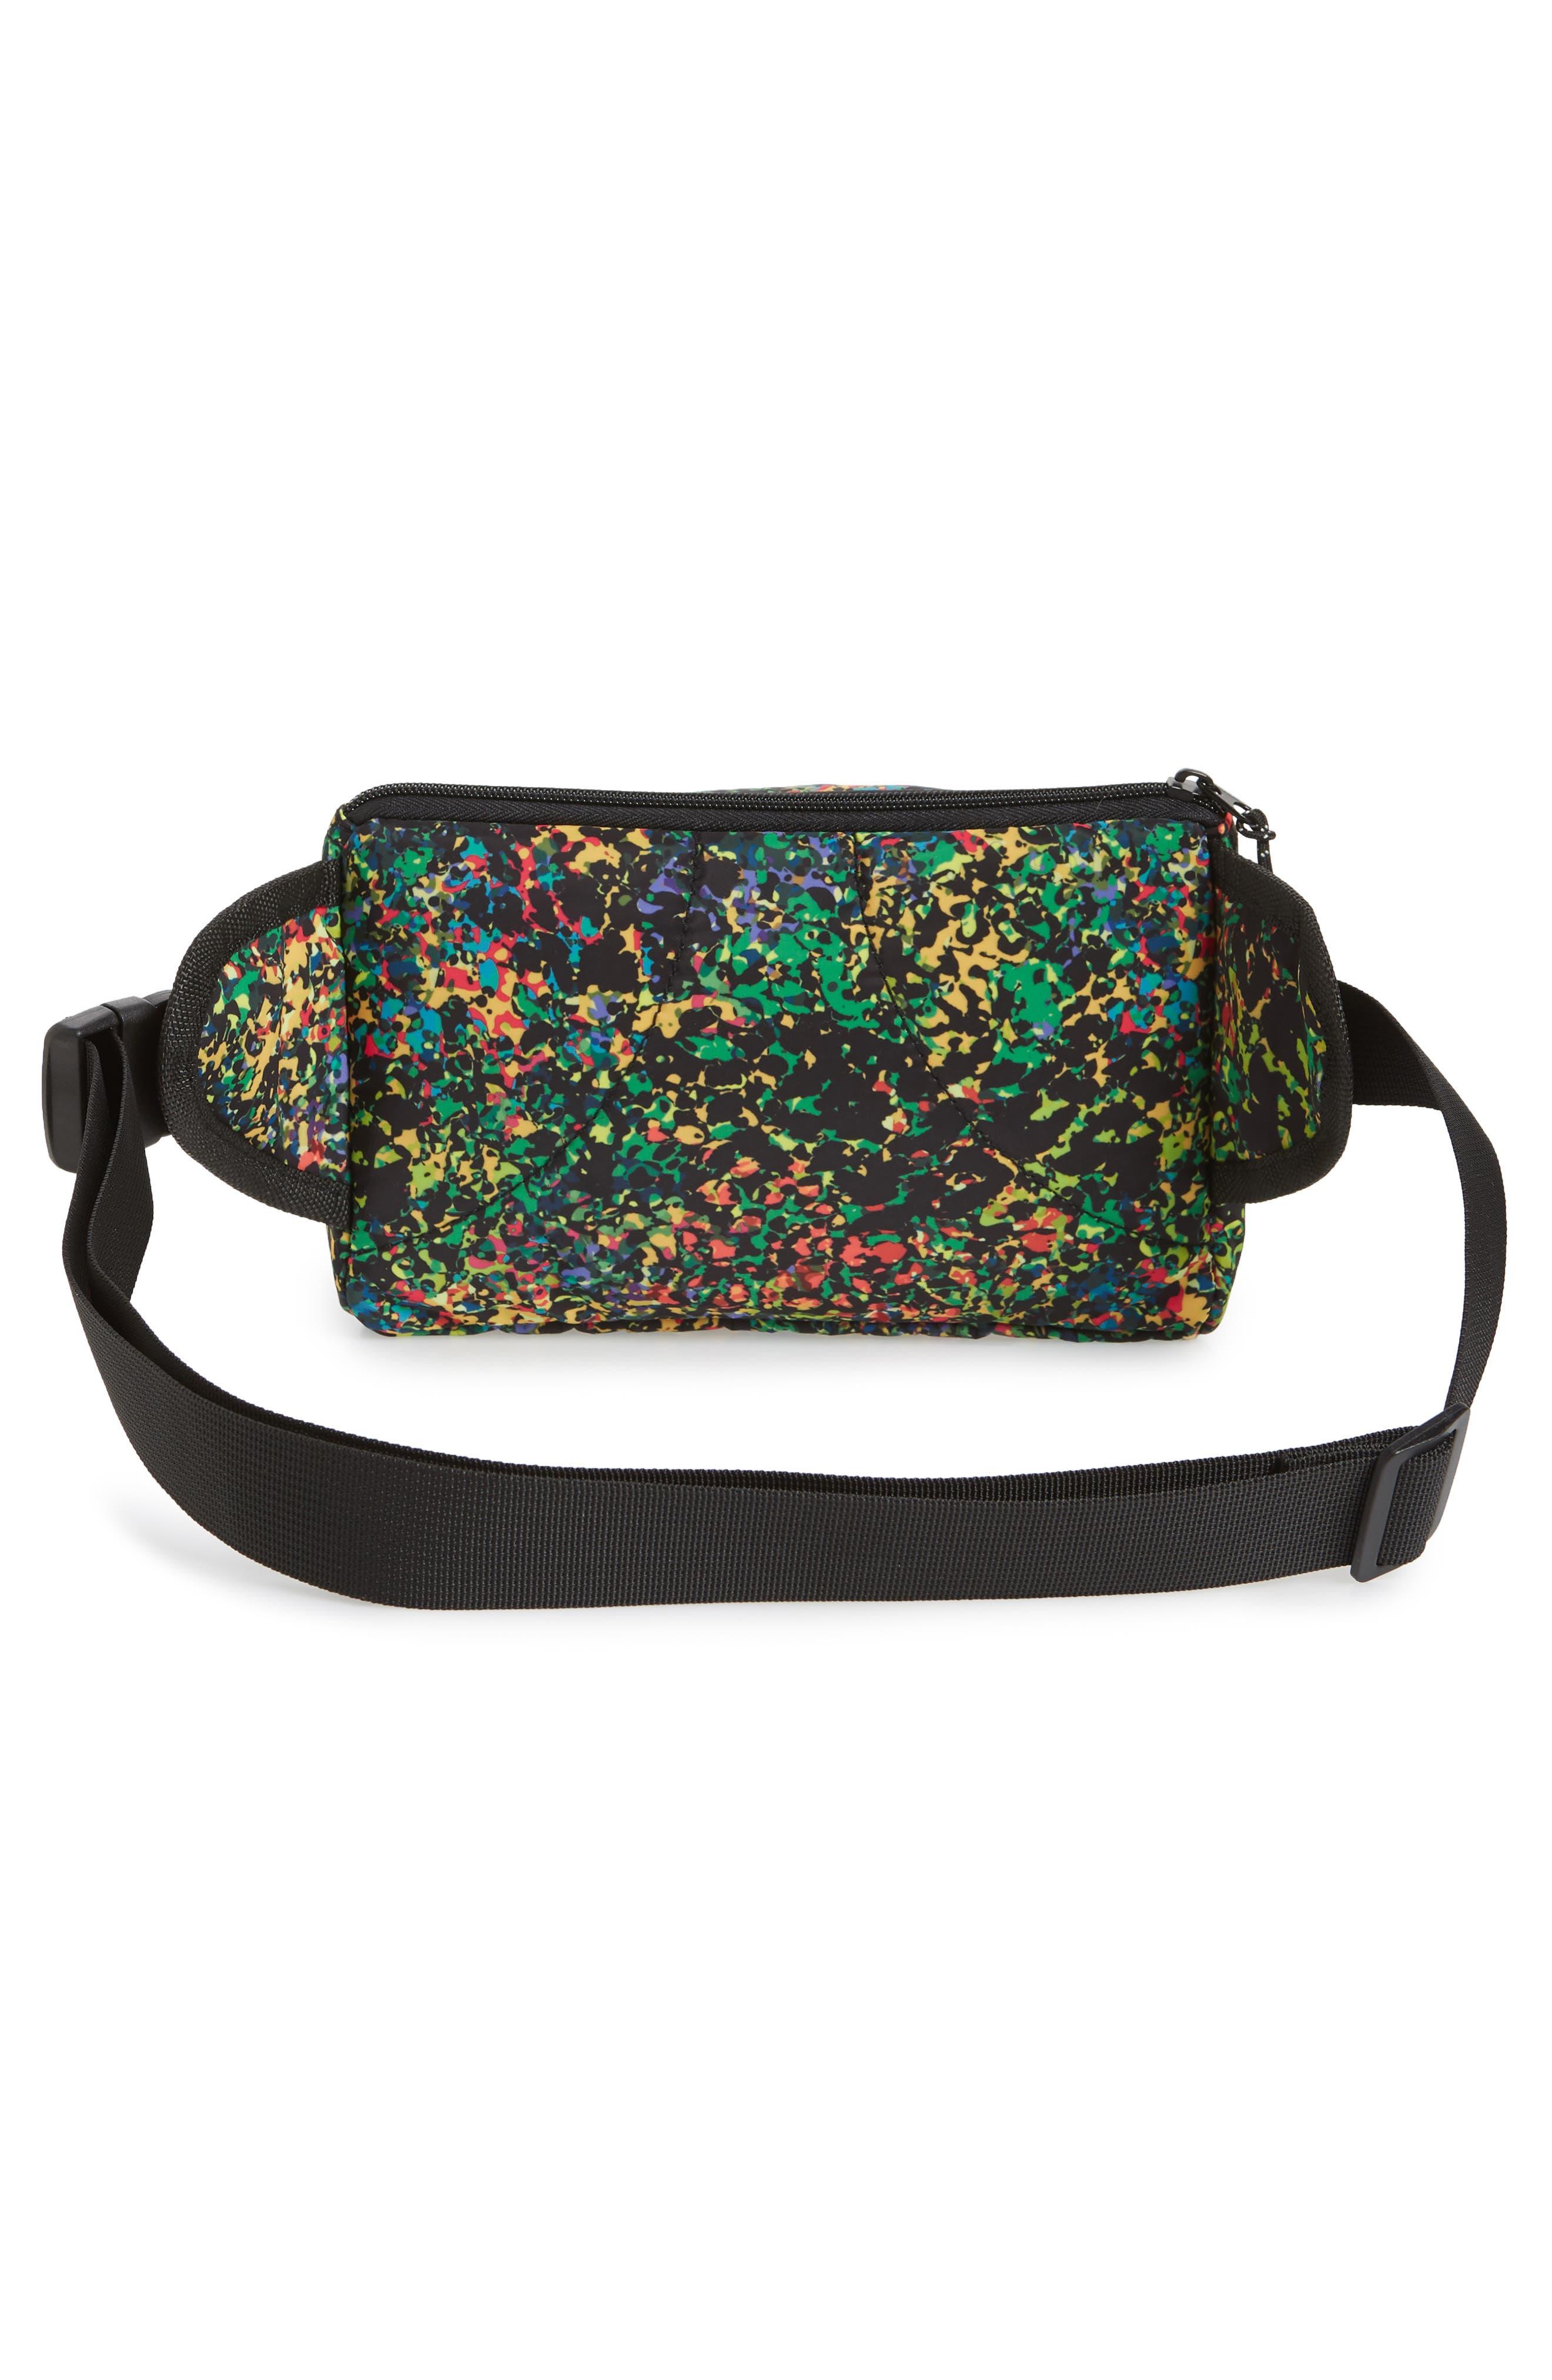 Sabre Crossbody Belt Bag,                             Alternate thumbnail 3, color,                             BLACK MULTI